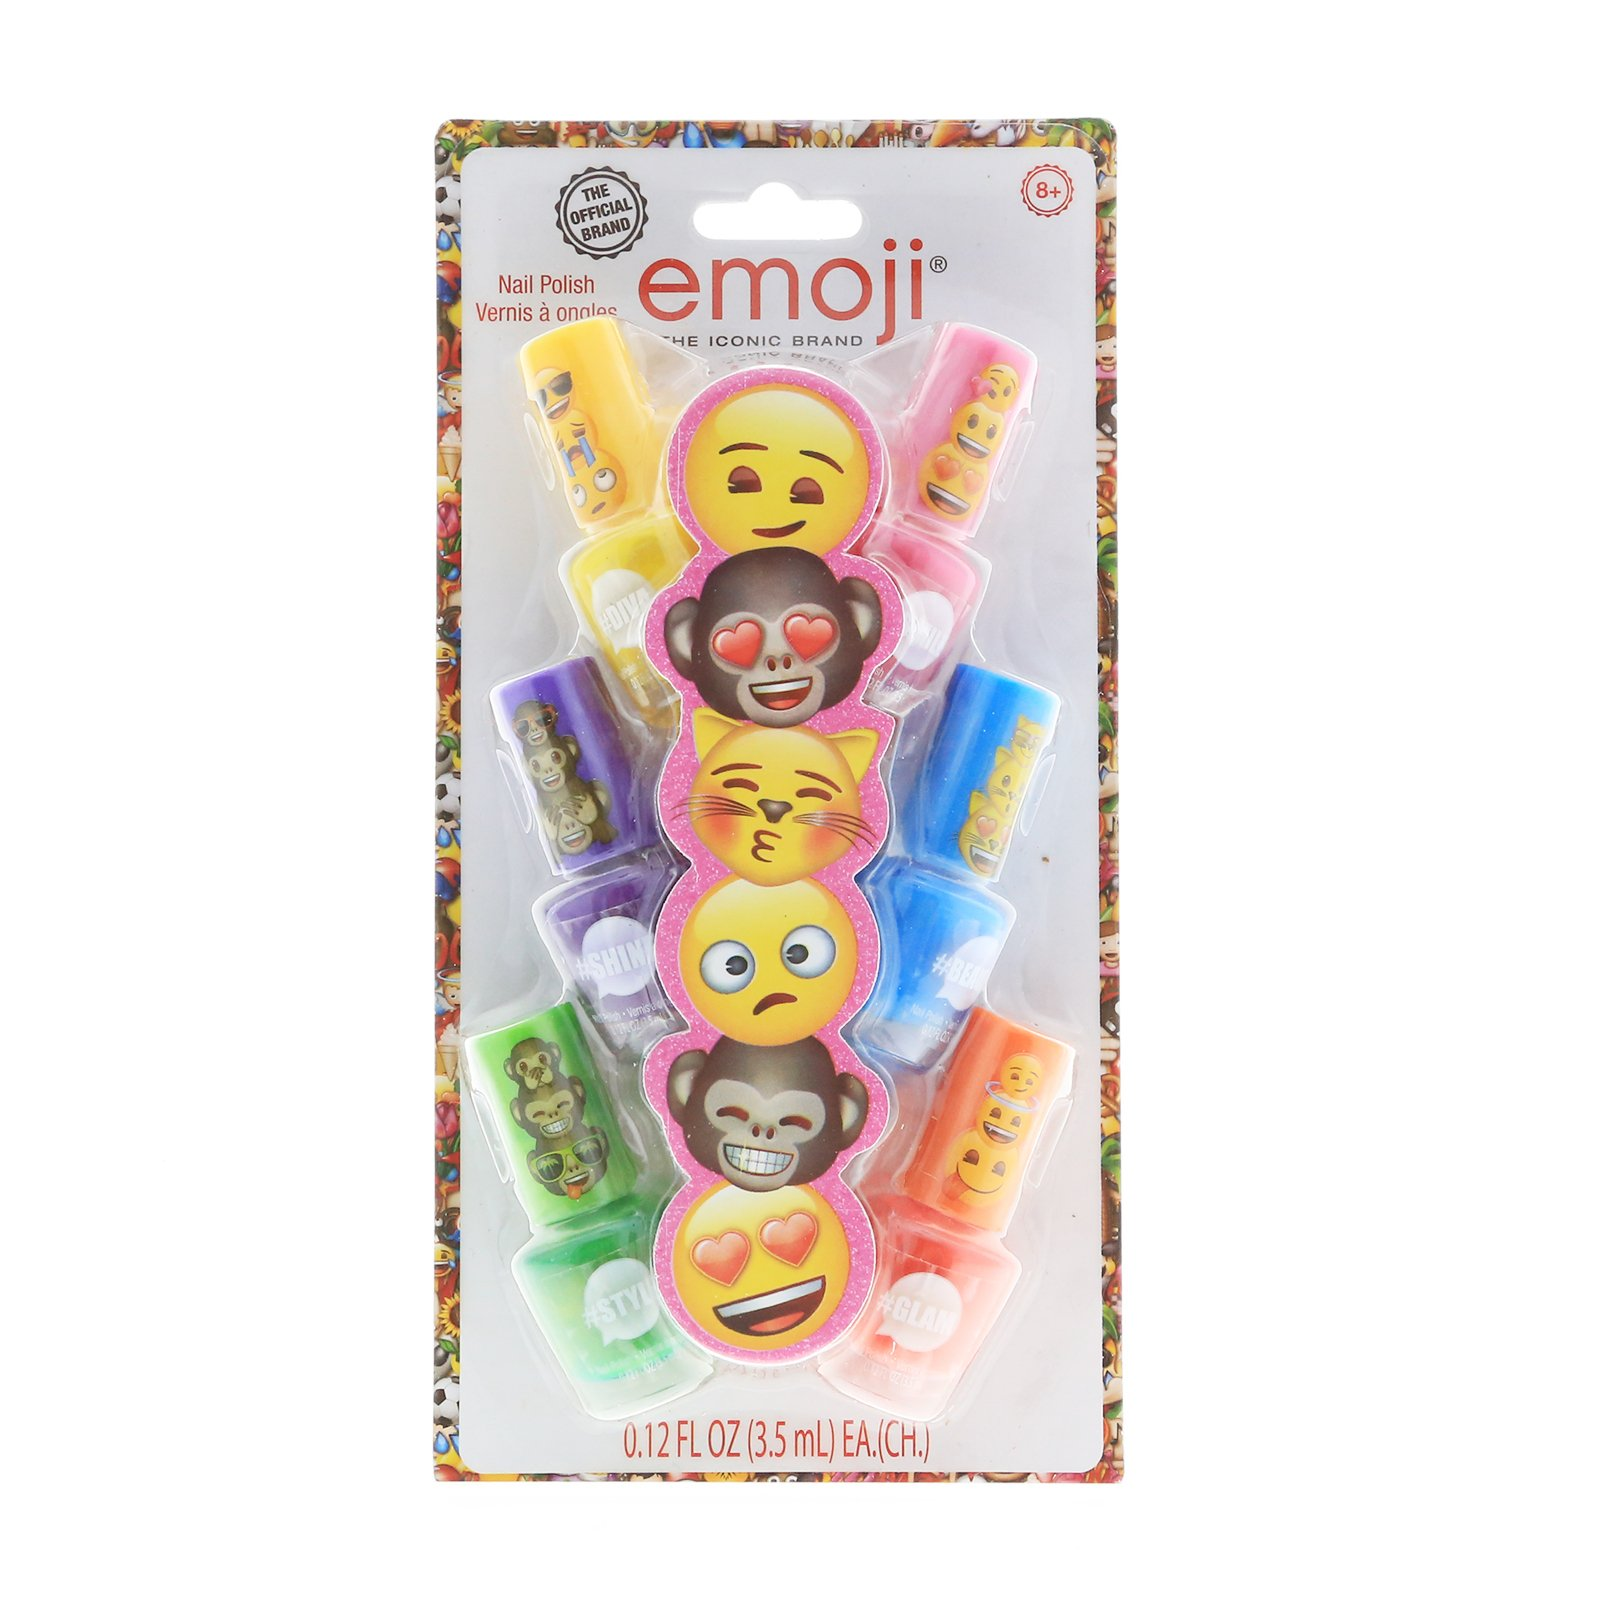 Emoji Licensed Nail Polish Girls Dress Up Party 6pk